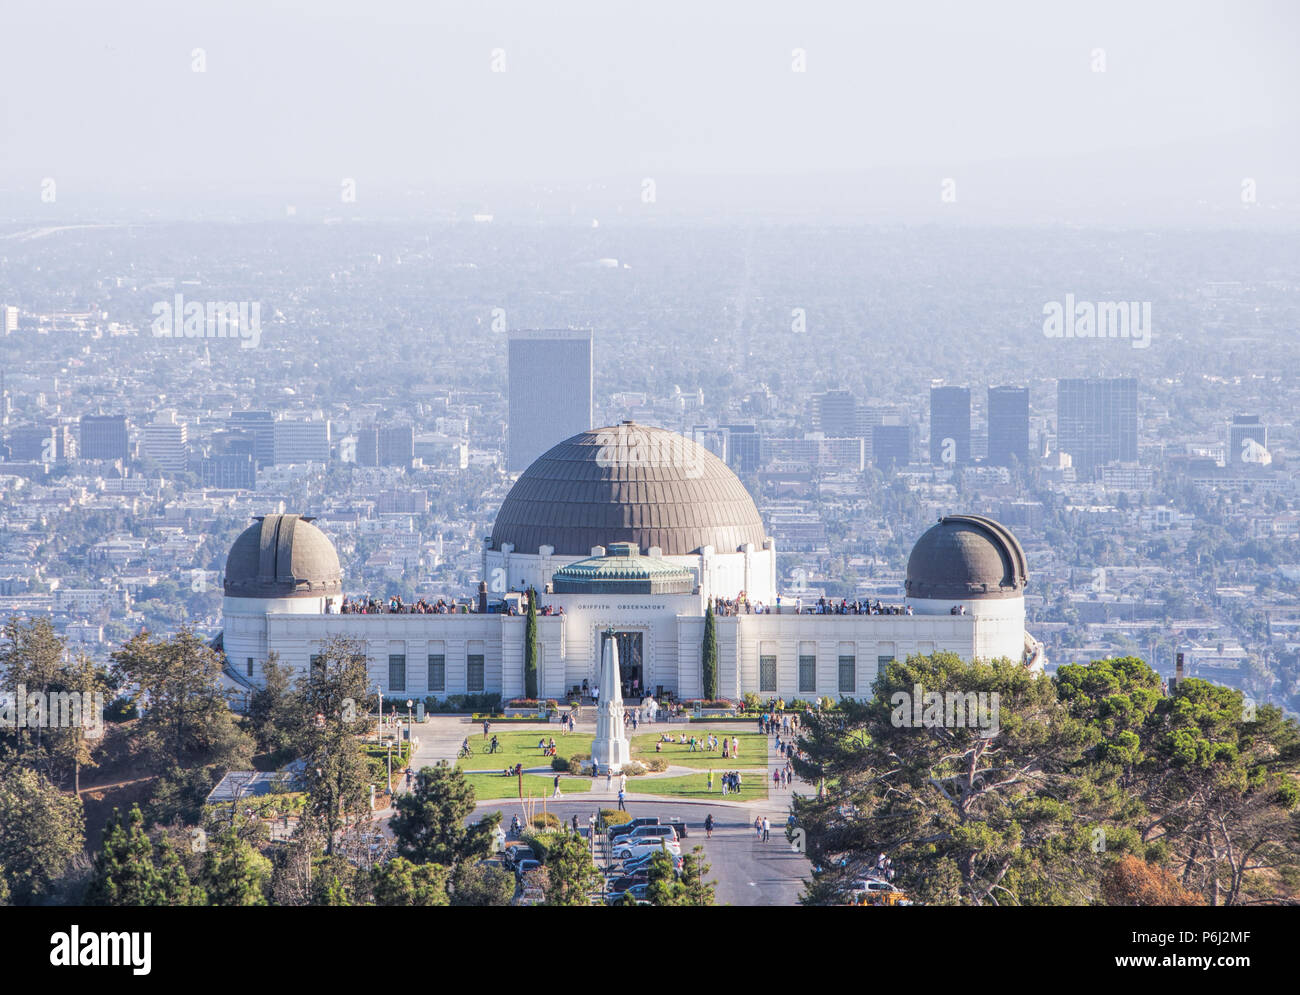 4. September 2016 - Los Angeles, USA. Berühmte Griffith Observatory museum Gebäude auf die Hollywood Hills. Viele Touristen, Planetarium mit sceni Stockbild